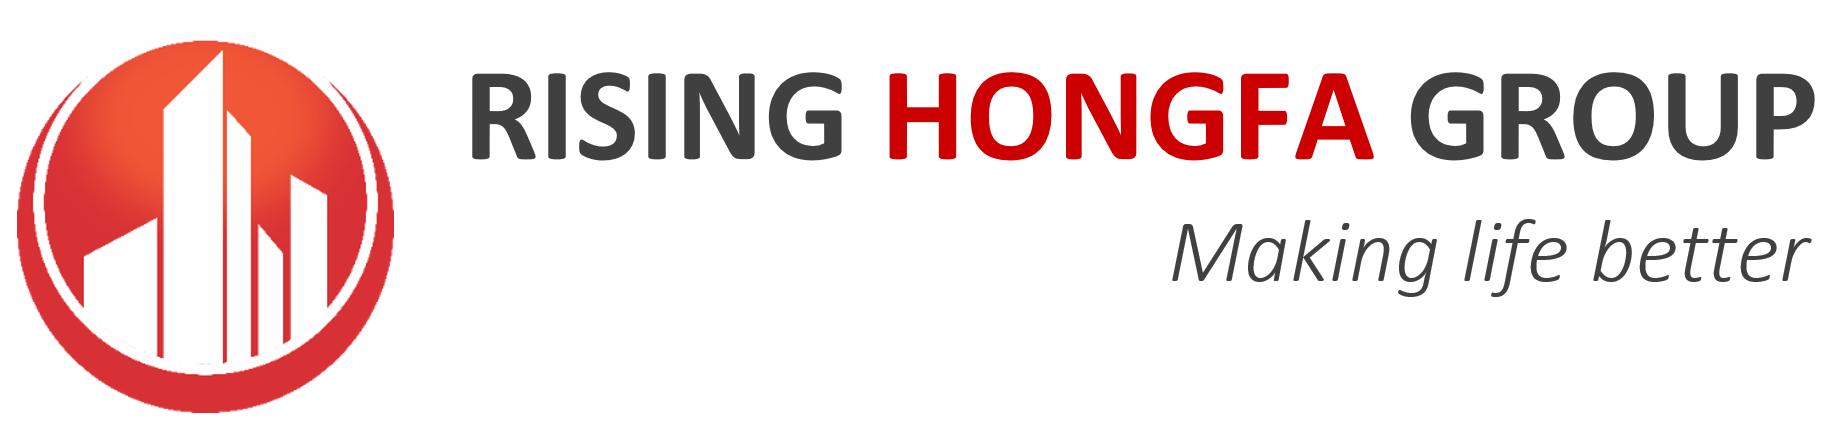 Rising Hongfa Group